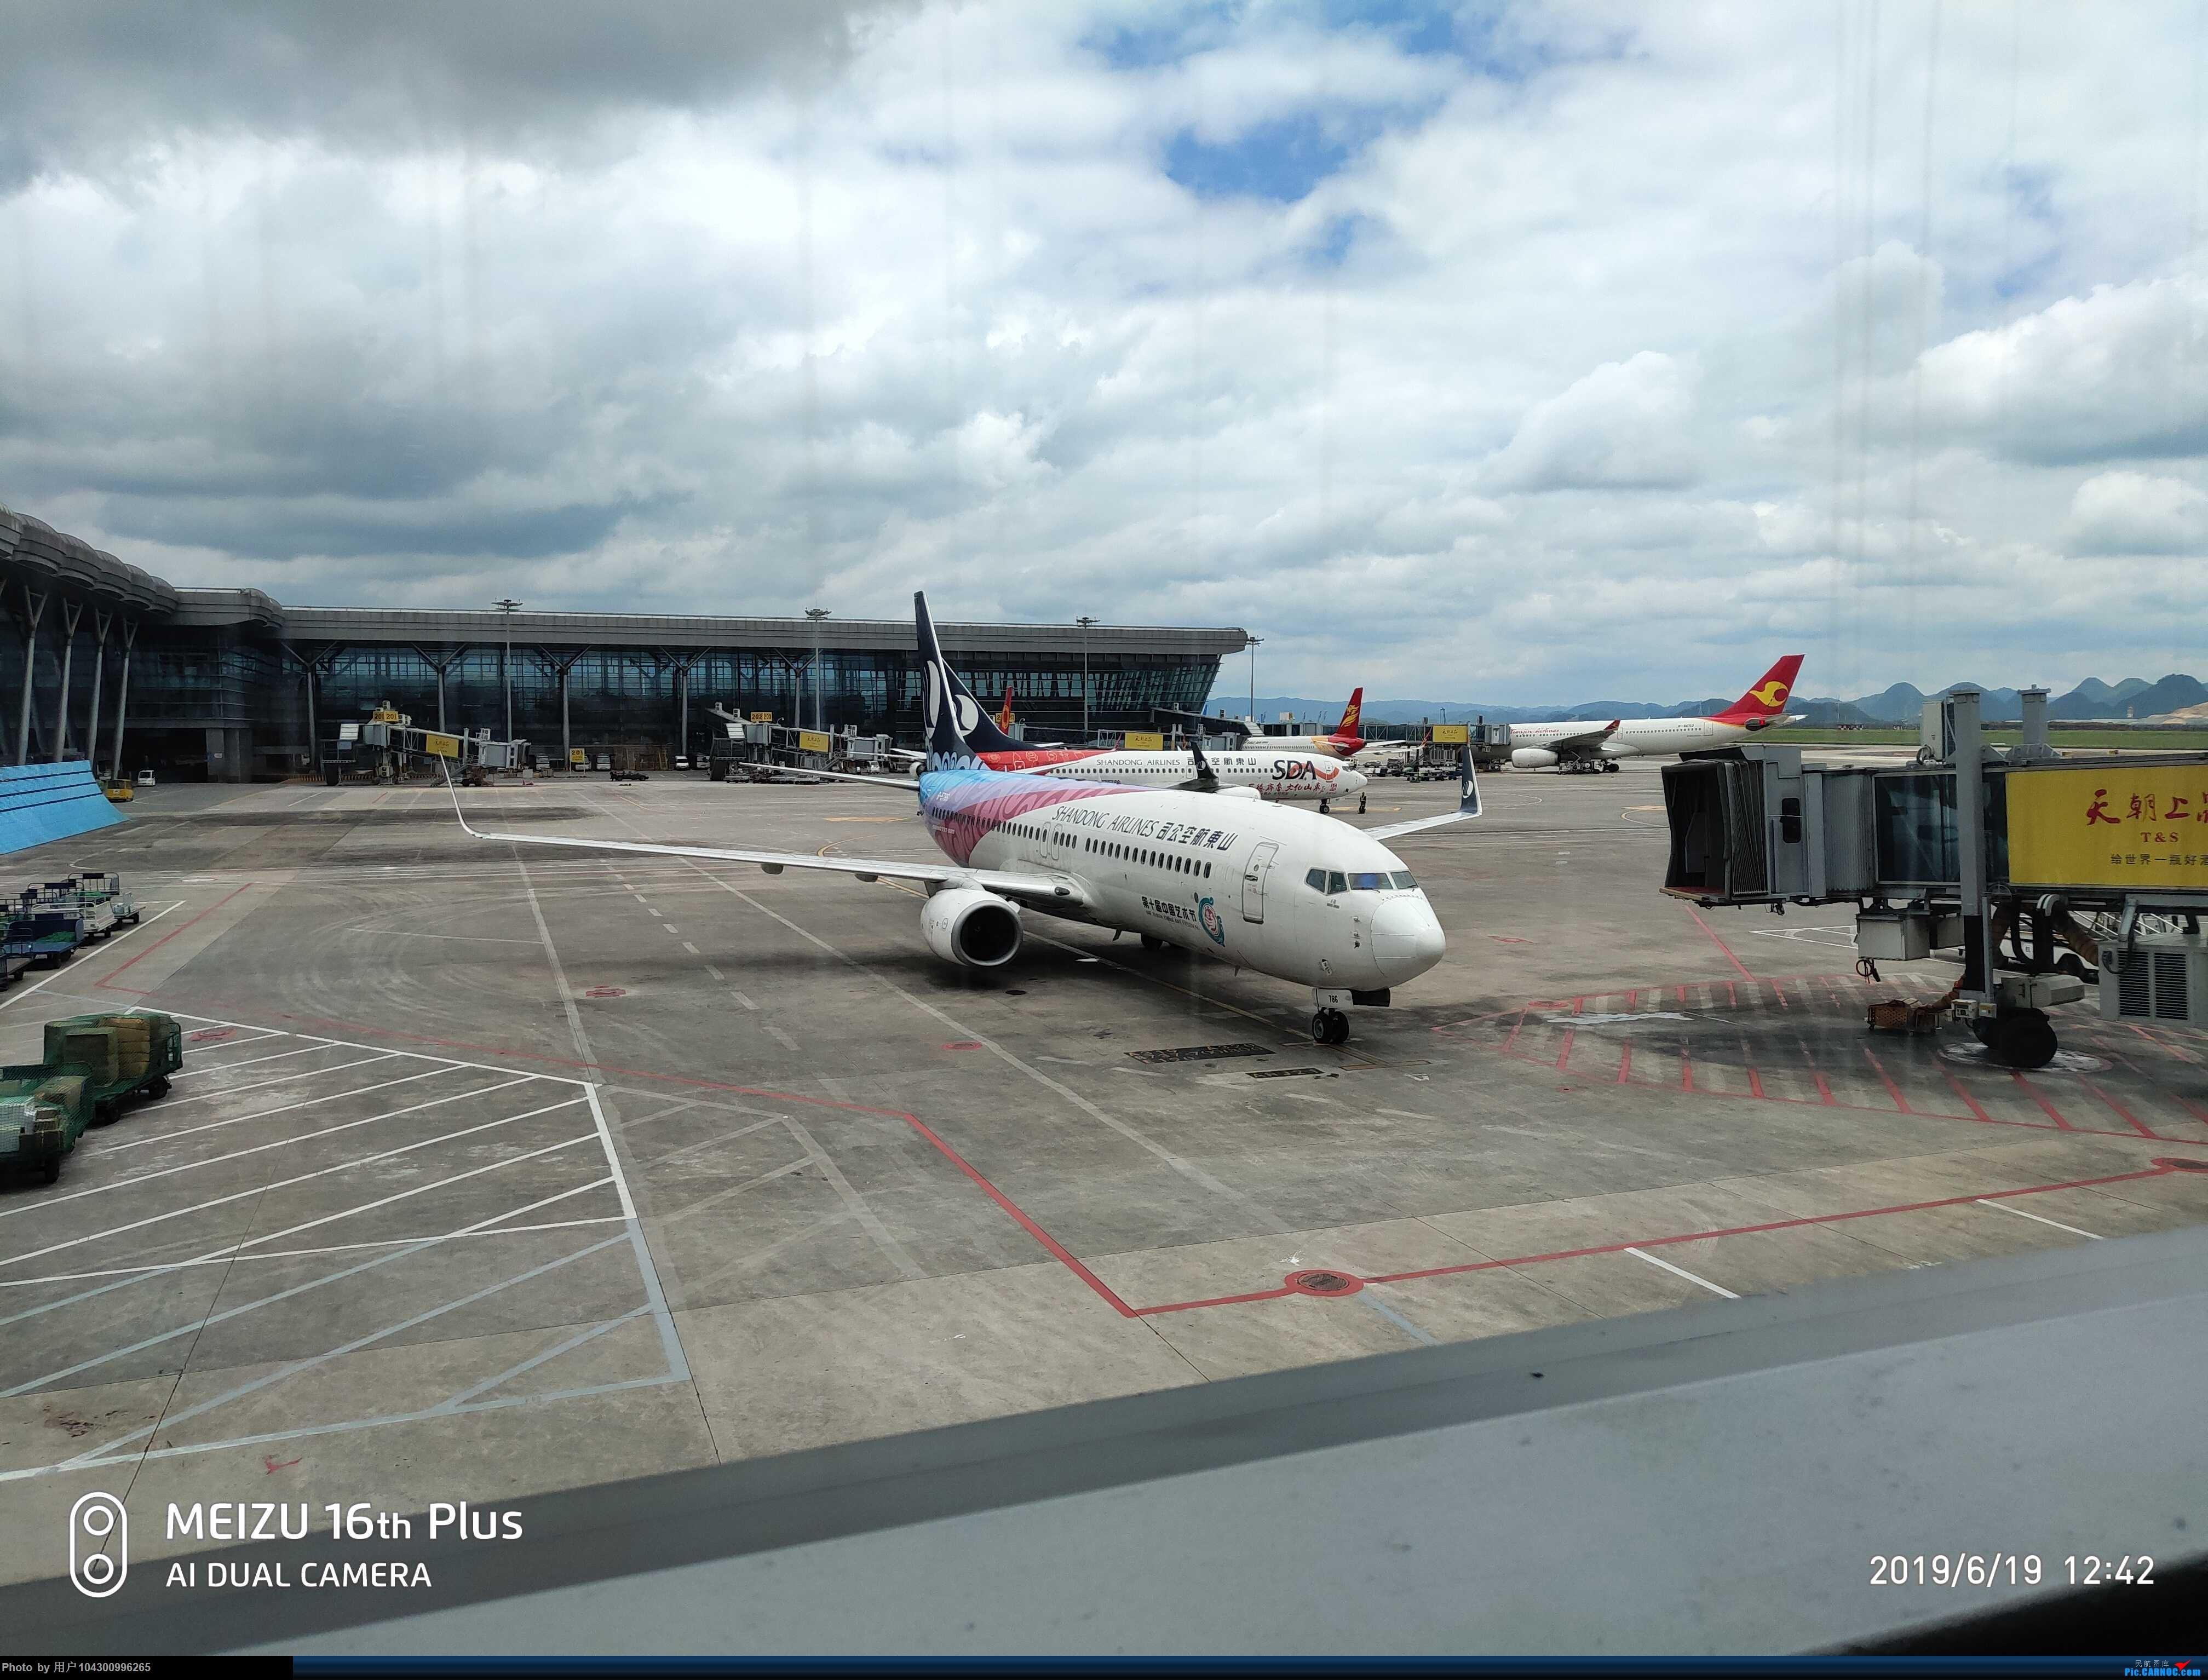 Re:[原创]DM哥飞行游记--贵阳往返荔波2日游 BOEING 737-800 B-5786 中国贵阳龙洞堡国际机场